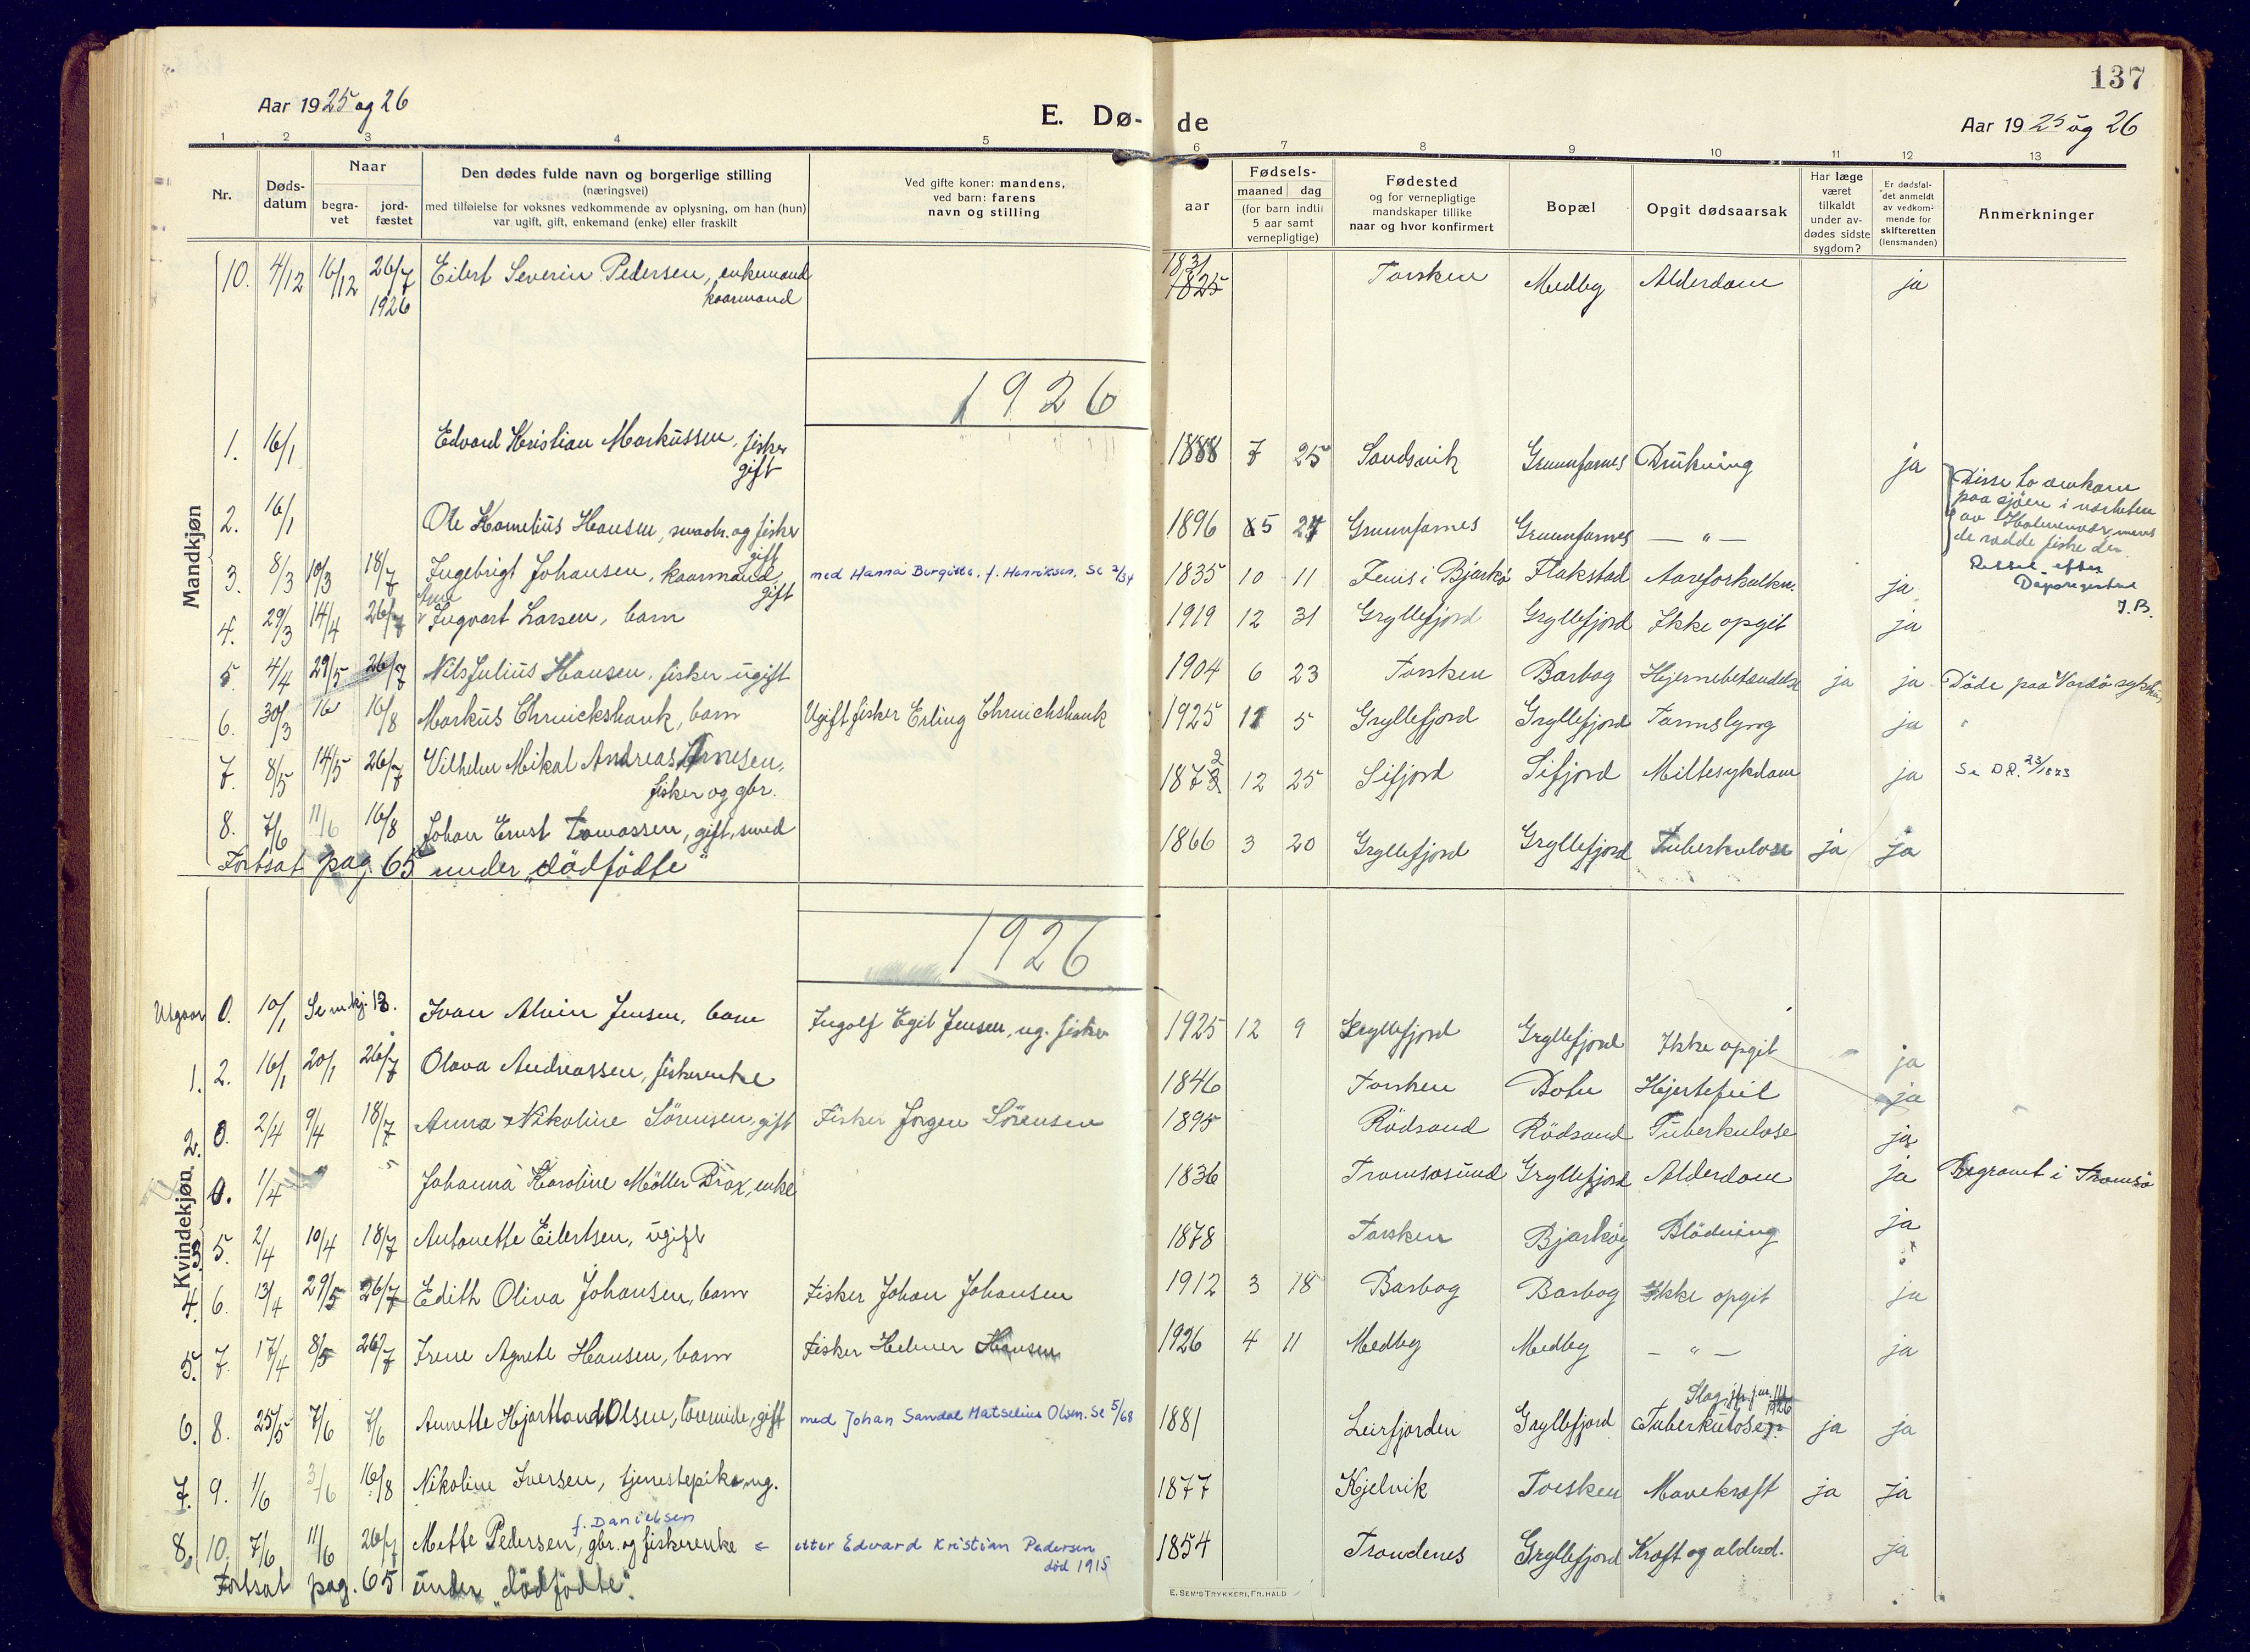 SATØ, Mefjord/Berg sokneprestkontor, G/Ga/Gaa: Ministerialbok nr. 10, 1916-1928, s. 137